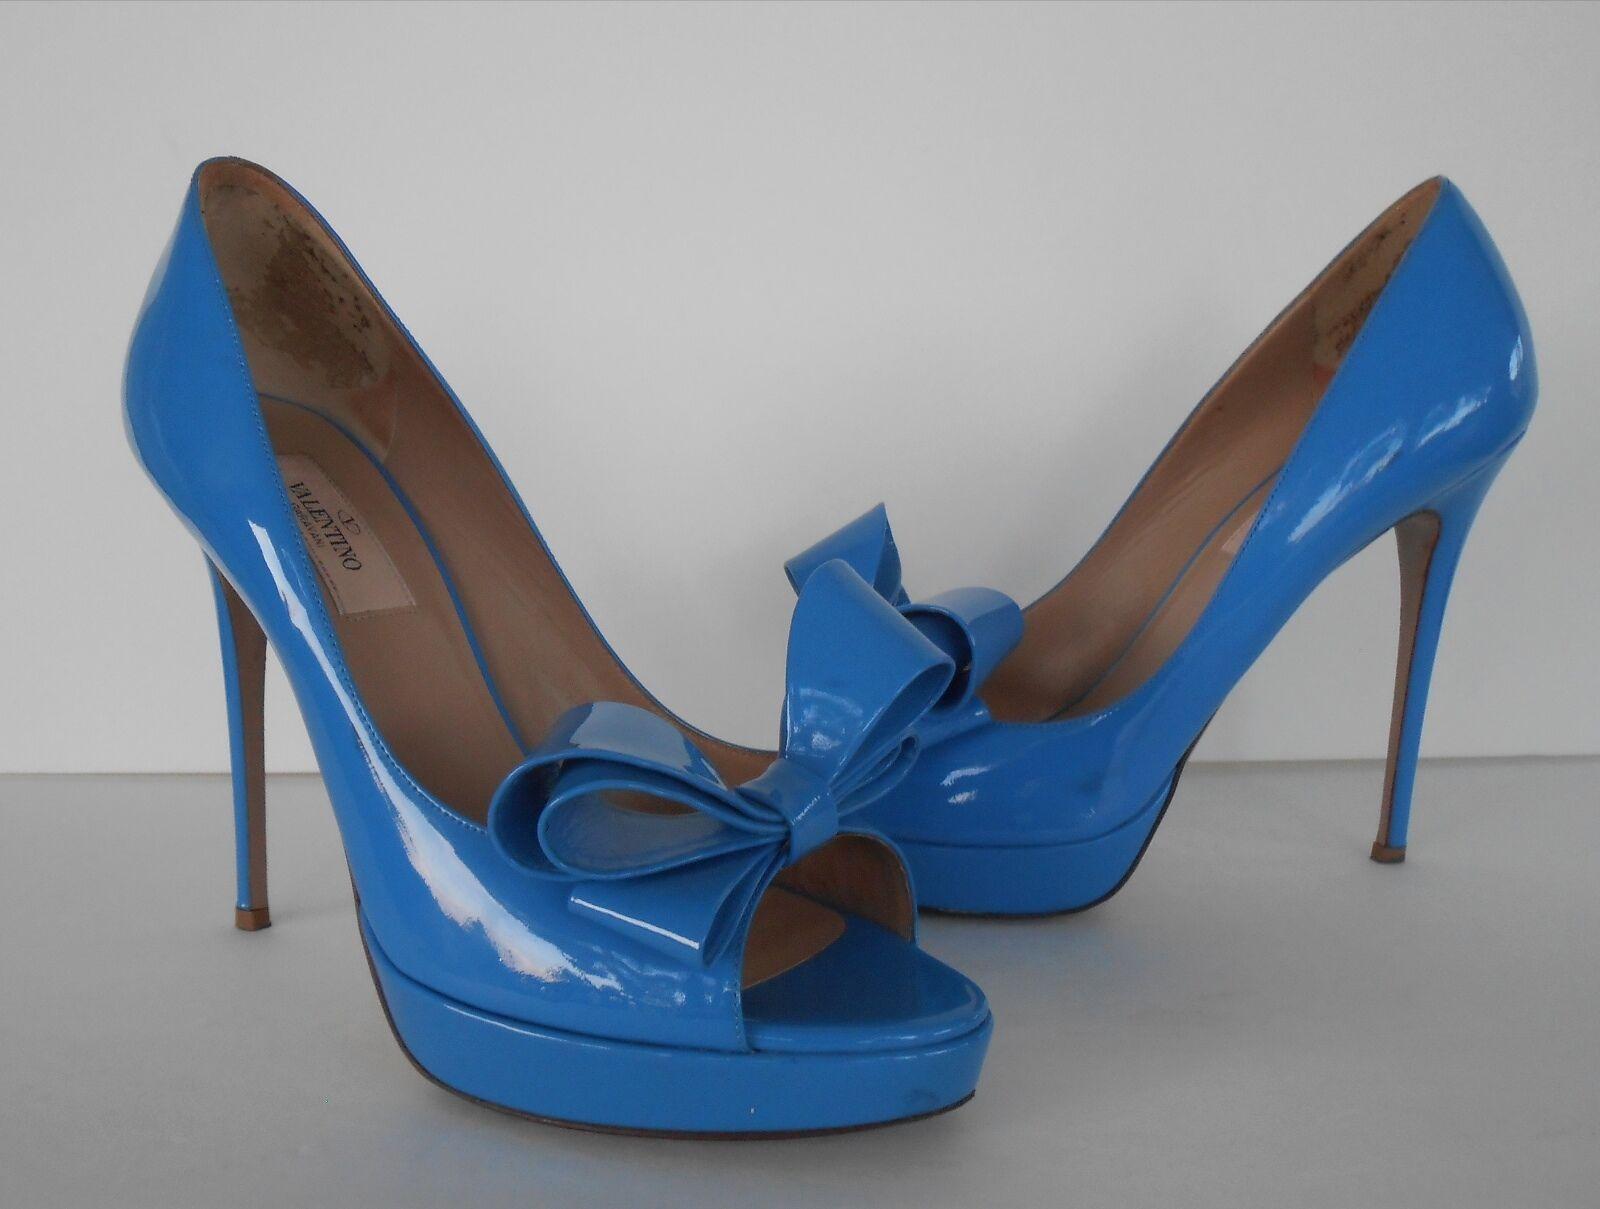 Valentino 'Couture' Patent Patent Patent Leather Platform Pump bluee Sz 39 8b91c9